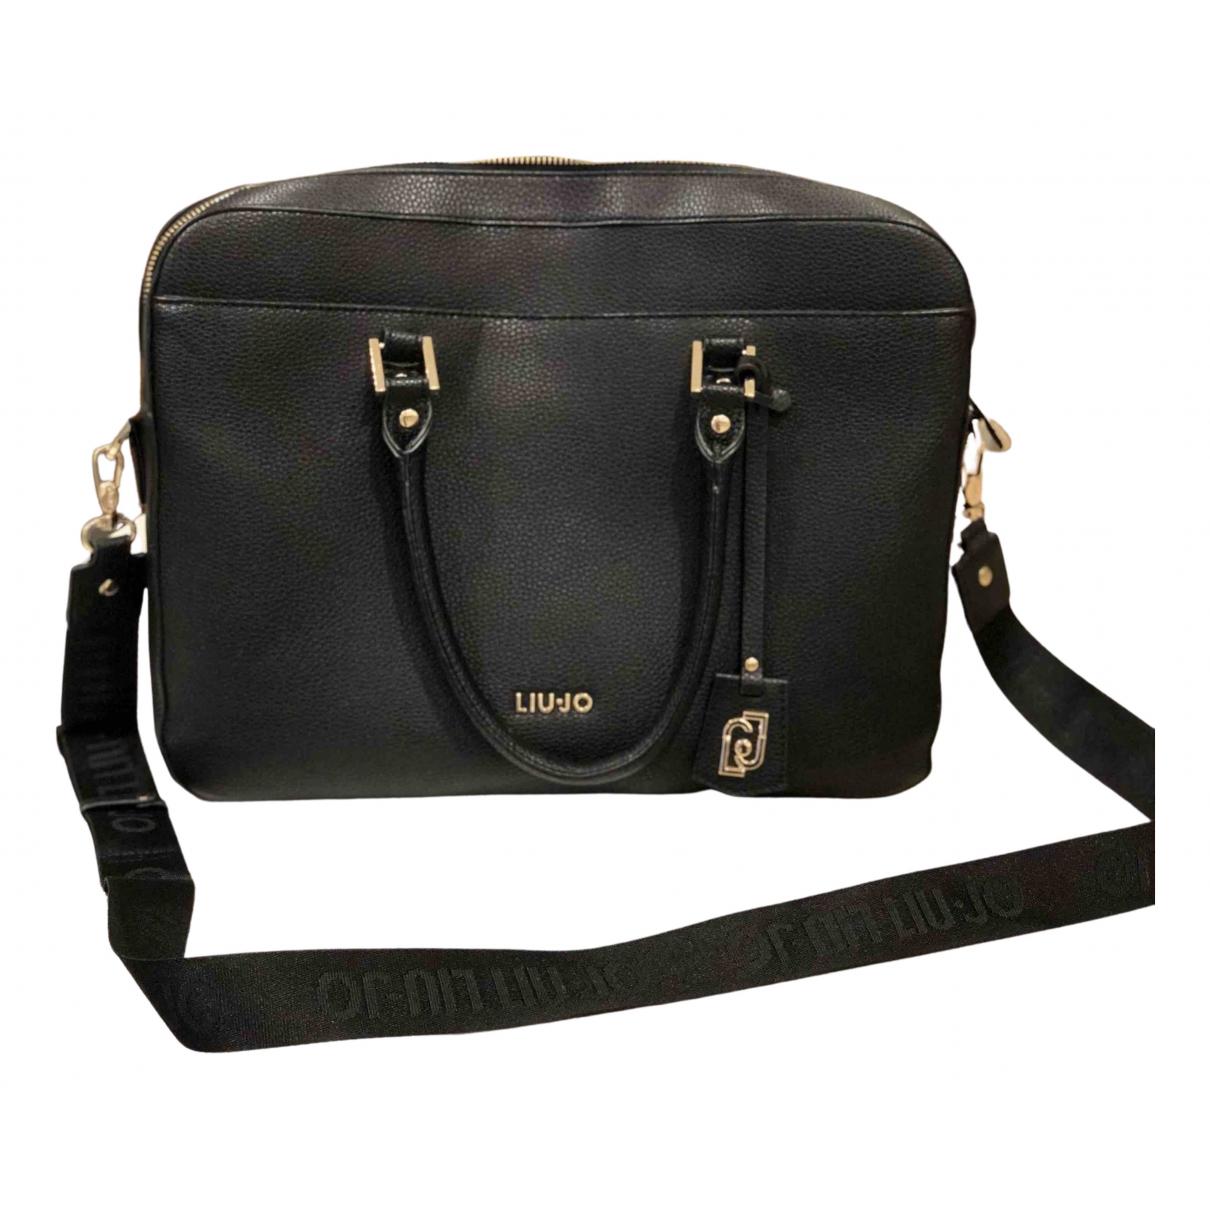 Liu.jo \N Handtasche in  Schwarz Synthetik